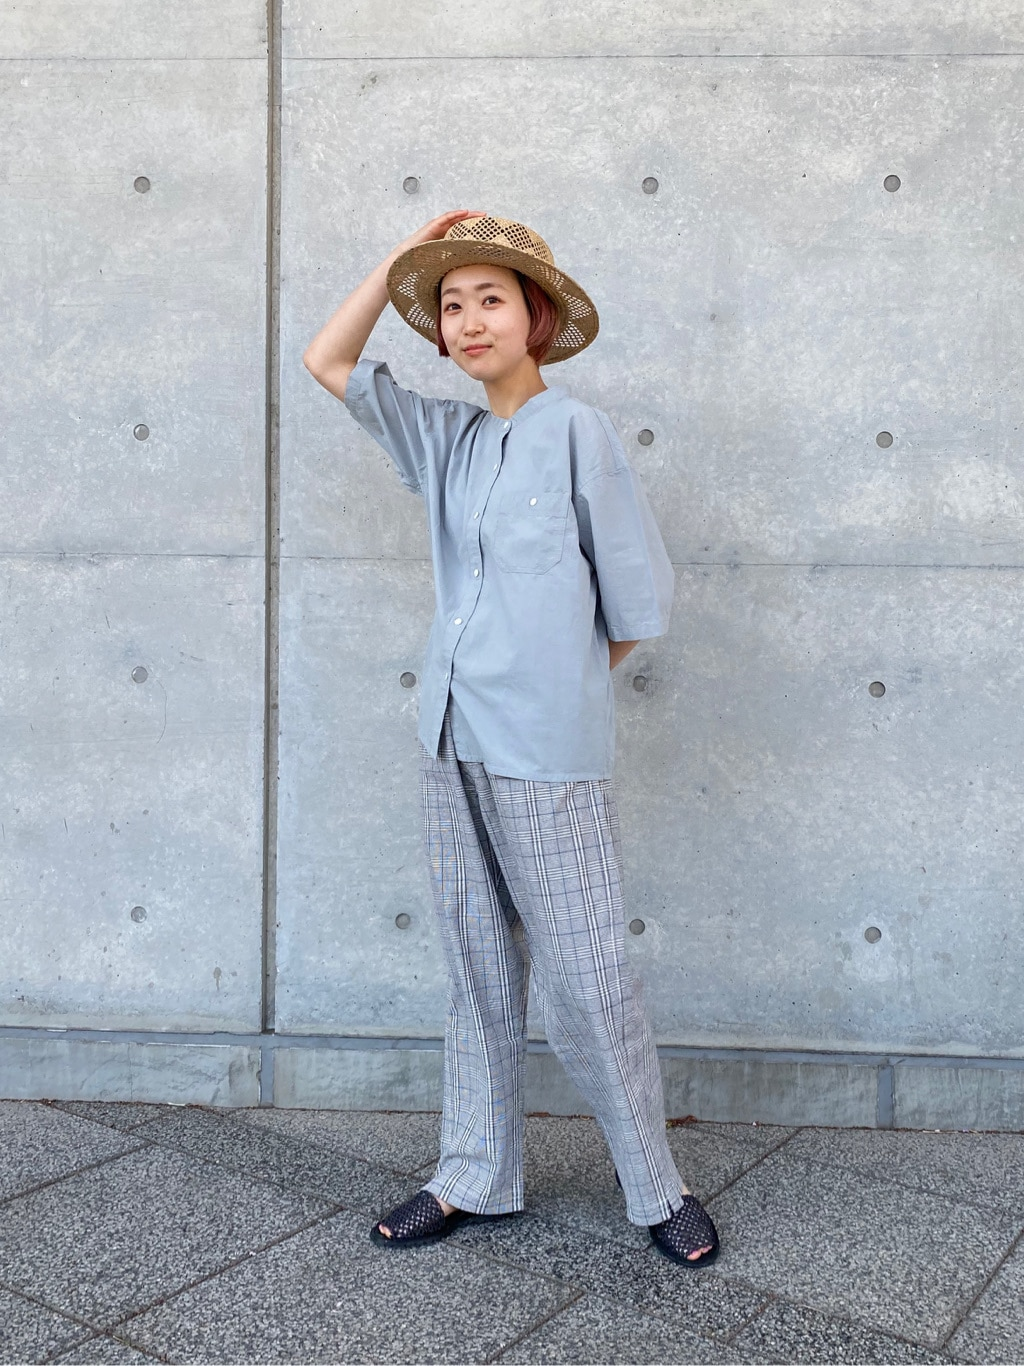 CHILD WOMAN , PAR ICI 東京スカイツリータウン・ソラマチ 2021.04.27